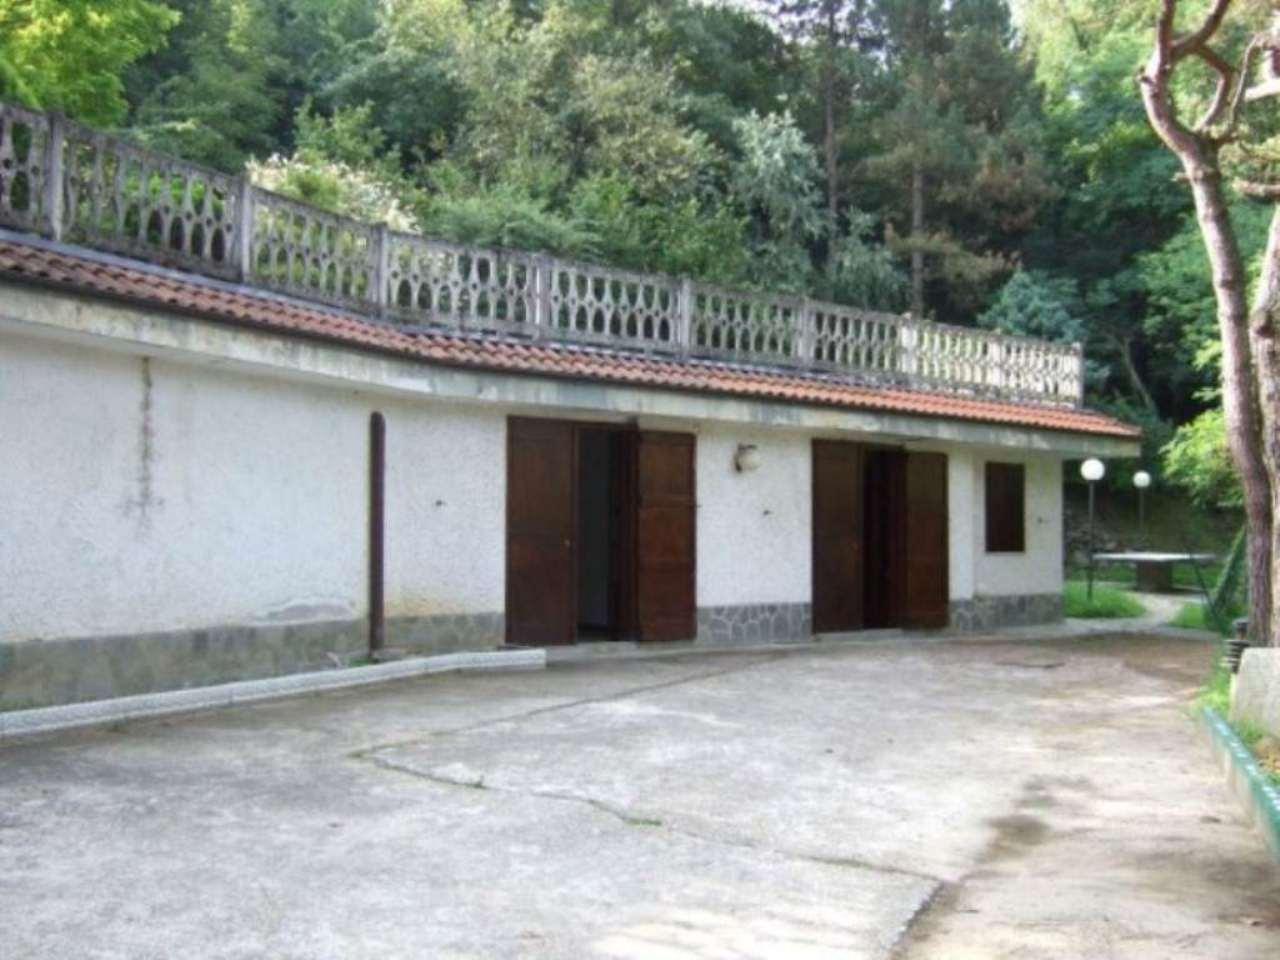 Foto 1 di Casa indipendente Frazione Gallareto, Piovà Massaia